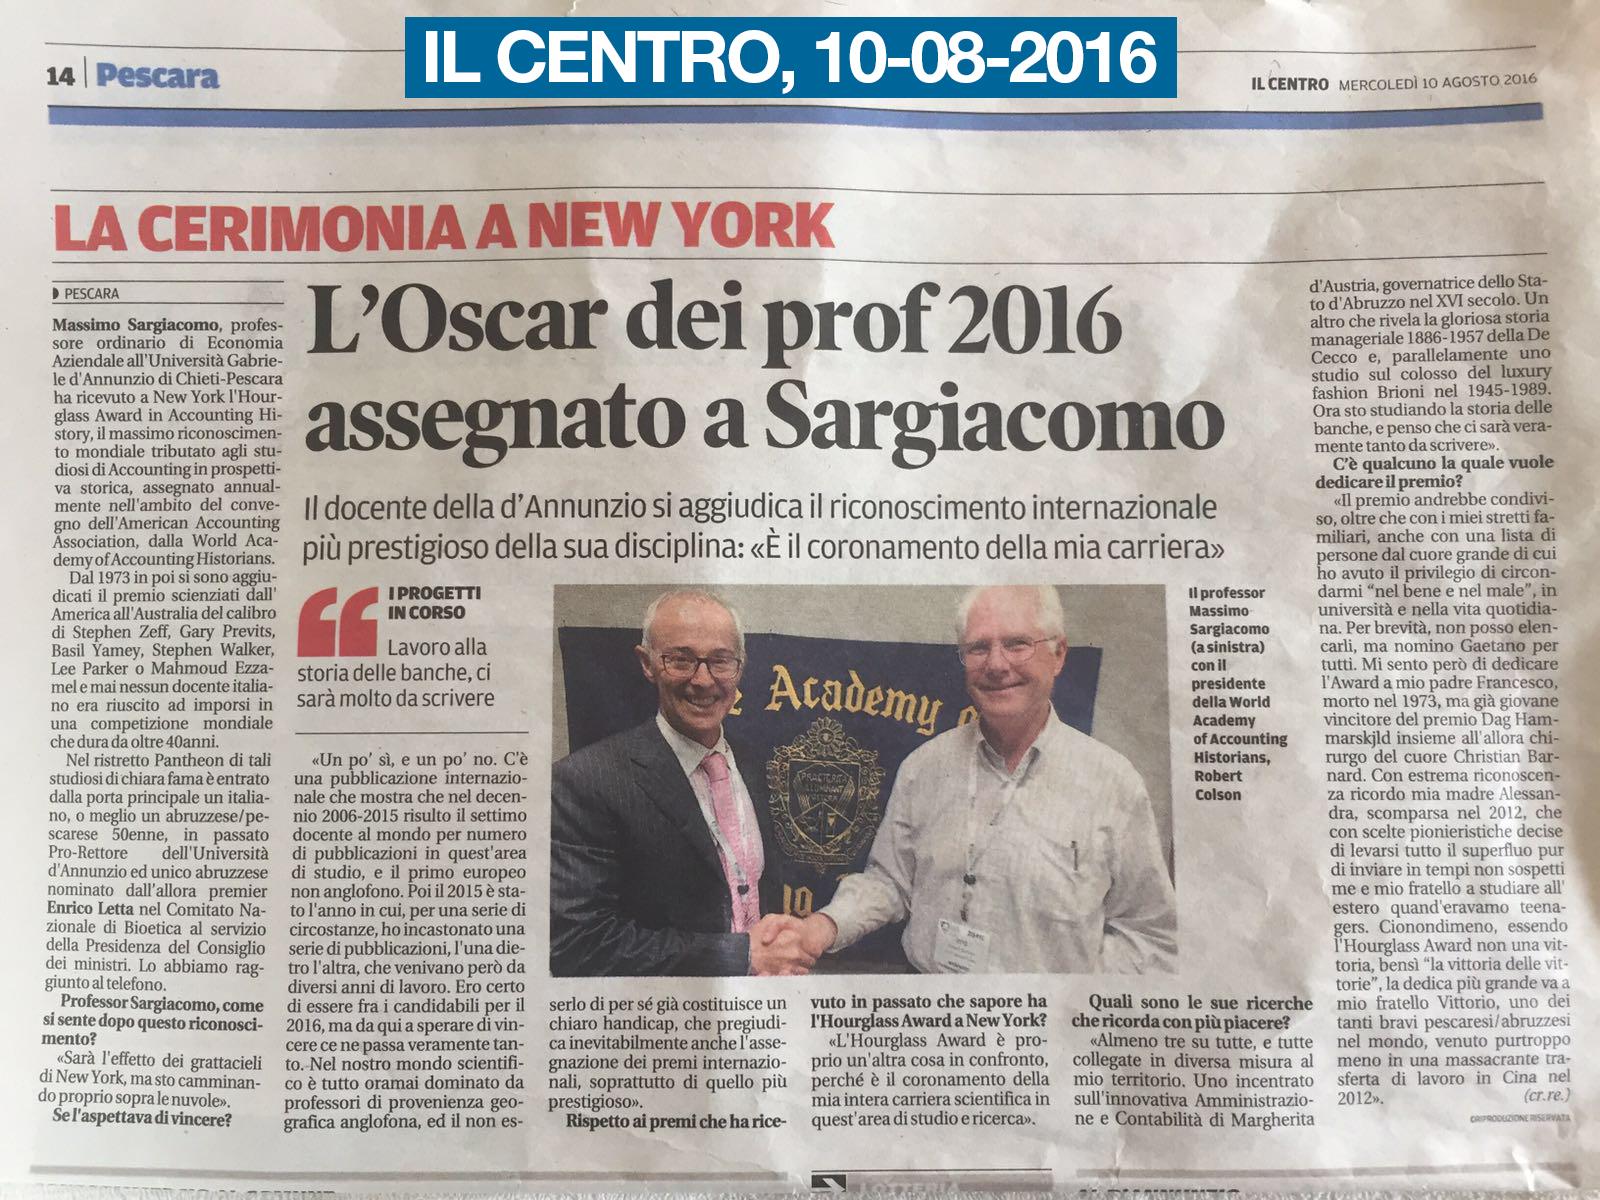 Massimo Sargiacomo - AAA New York 2016